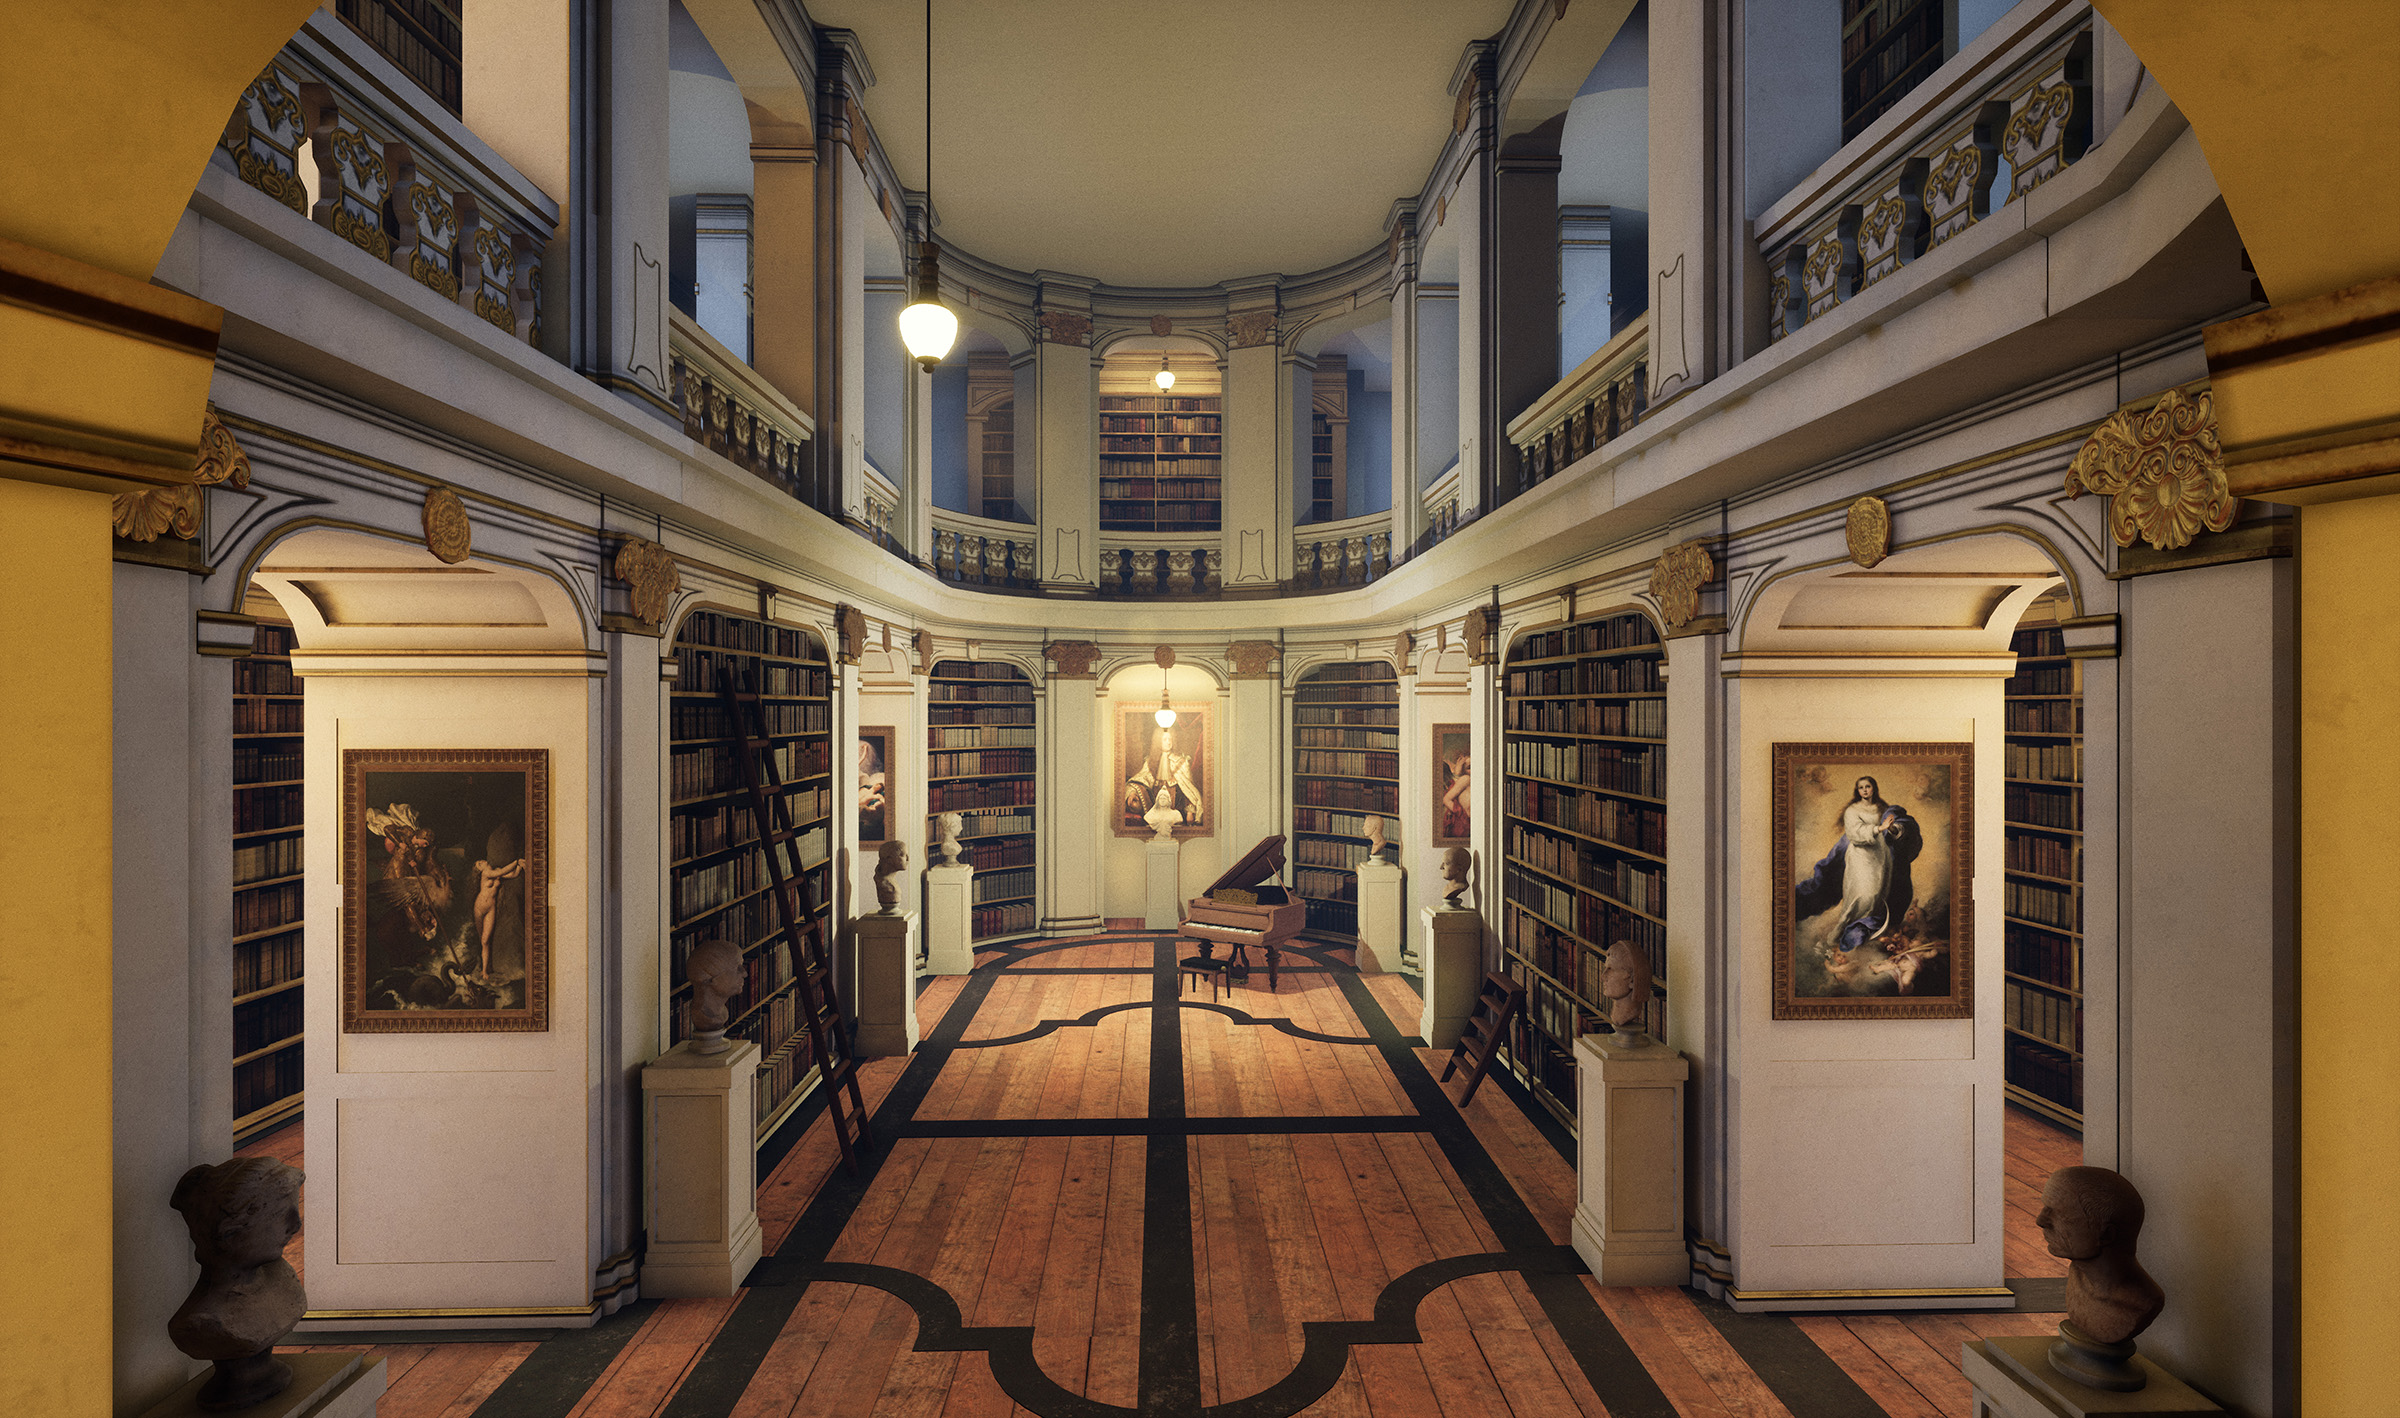 Art library by Mengyue Wang Sen Yang